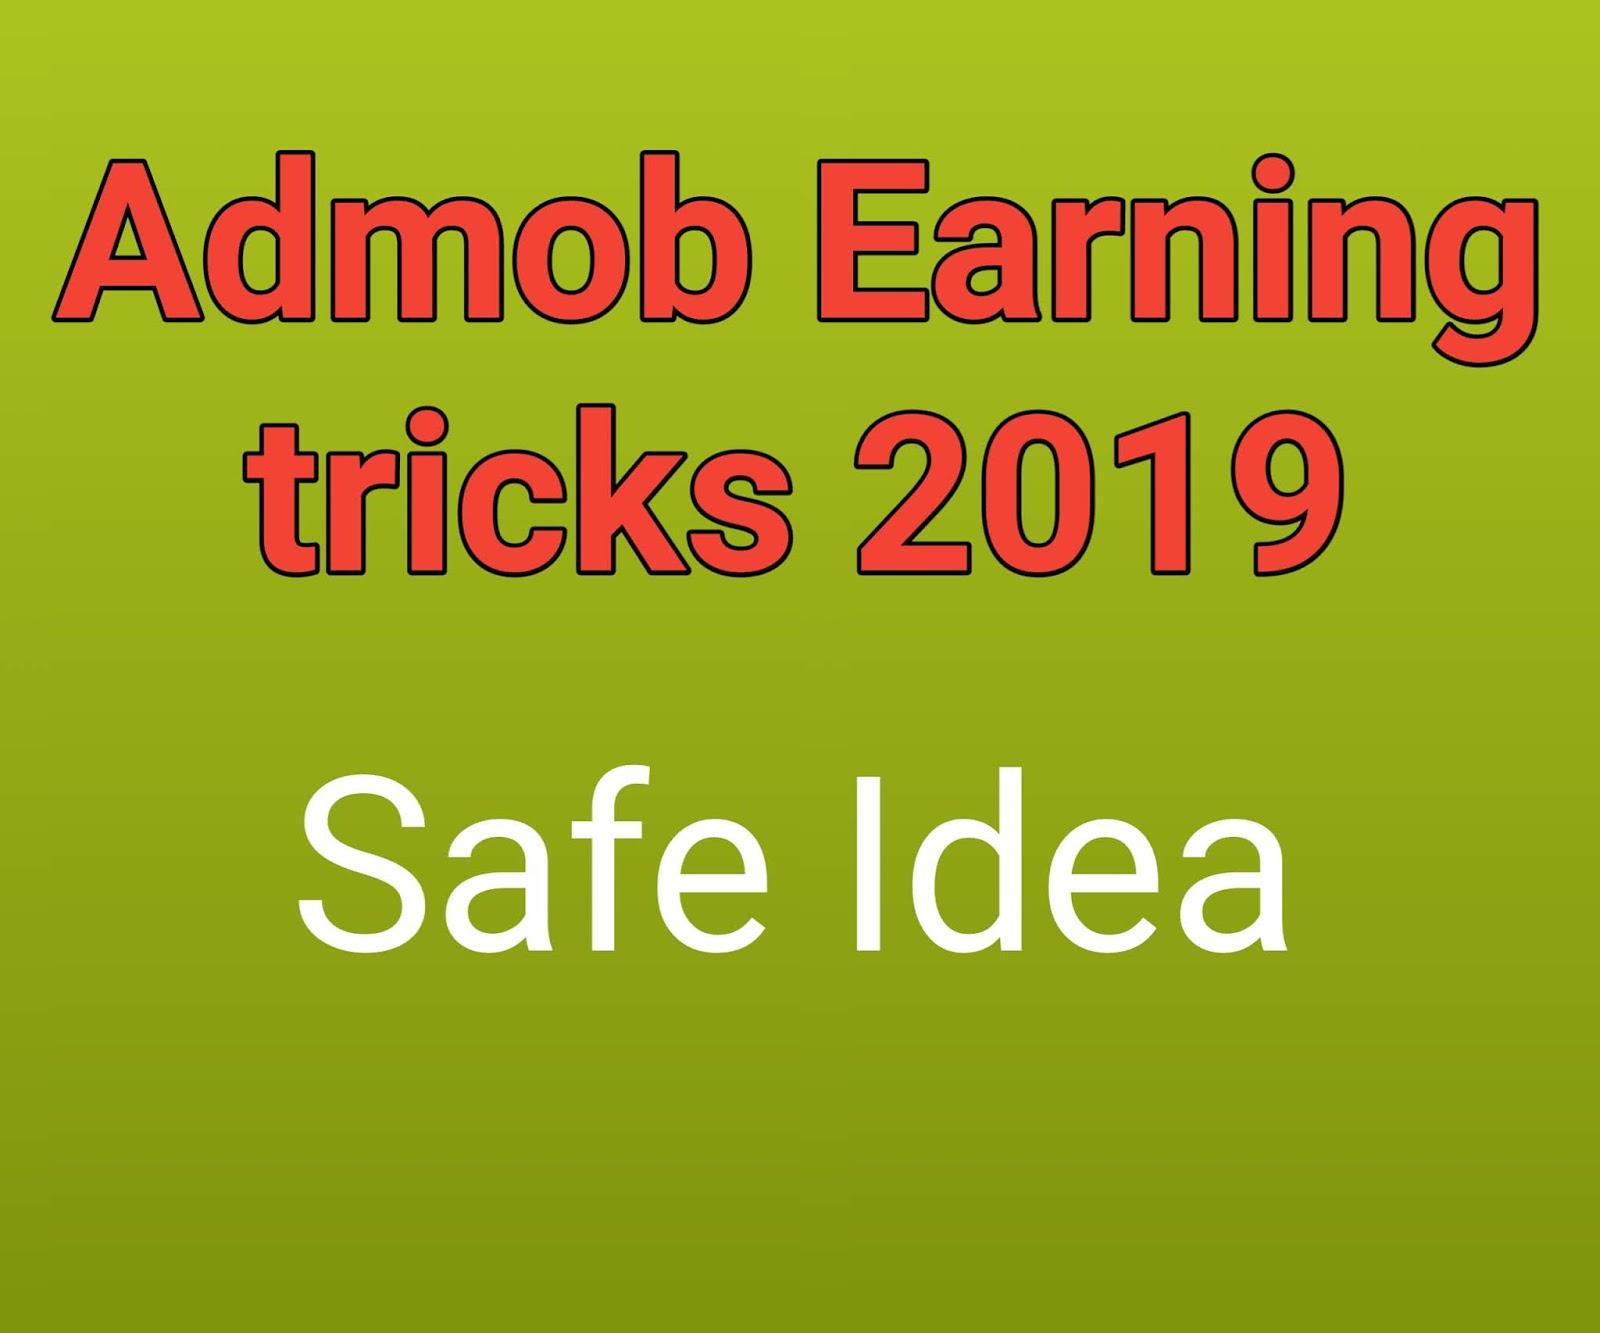 admob earning trick 2019 - Aspo xyz News